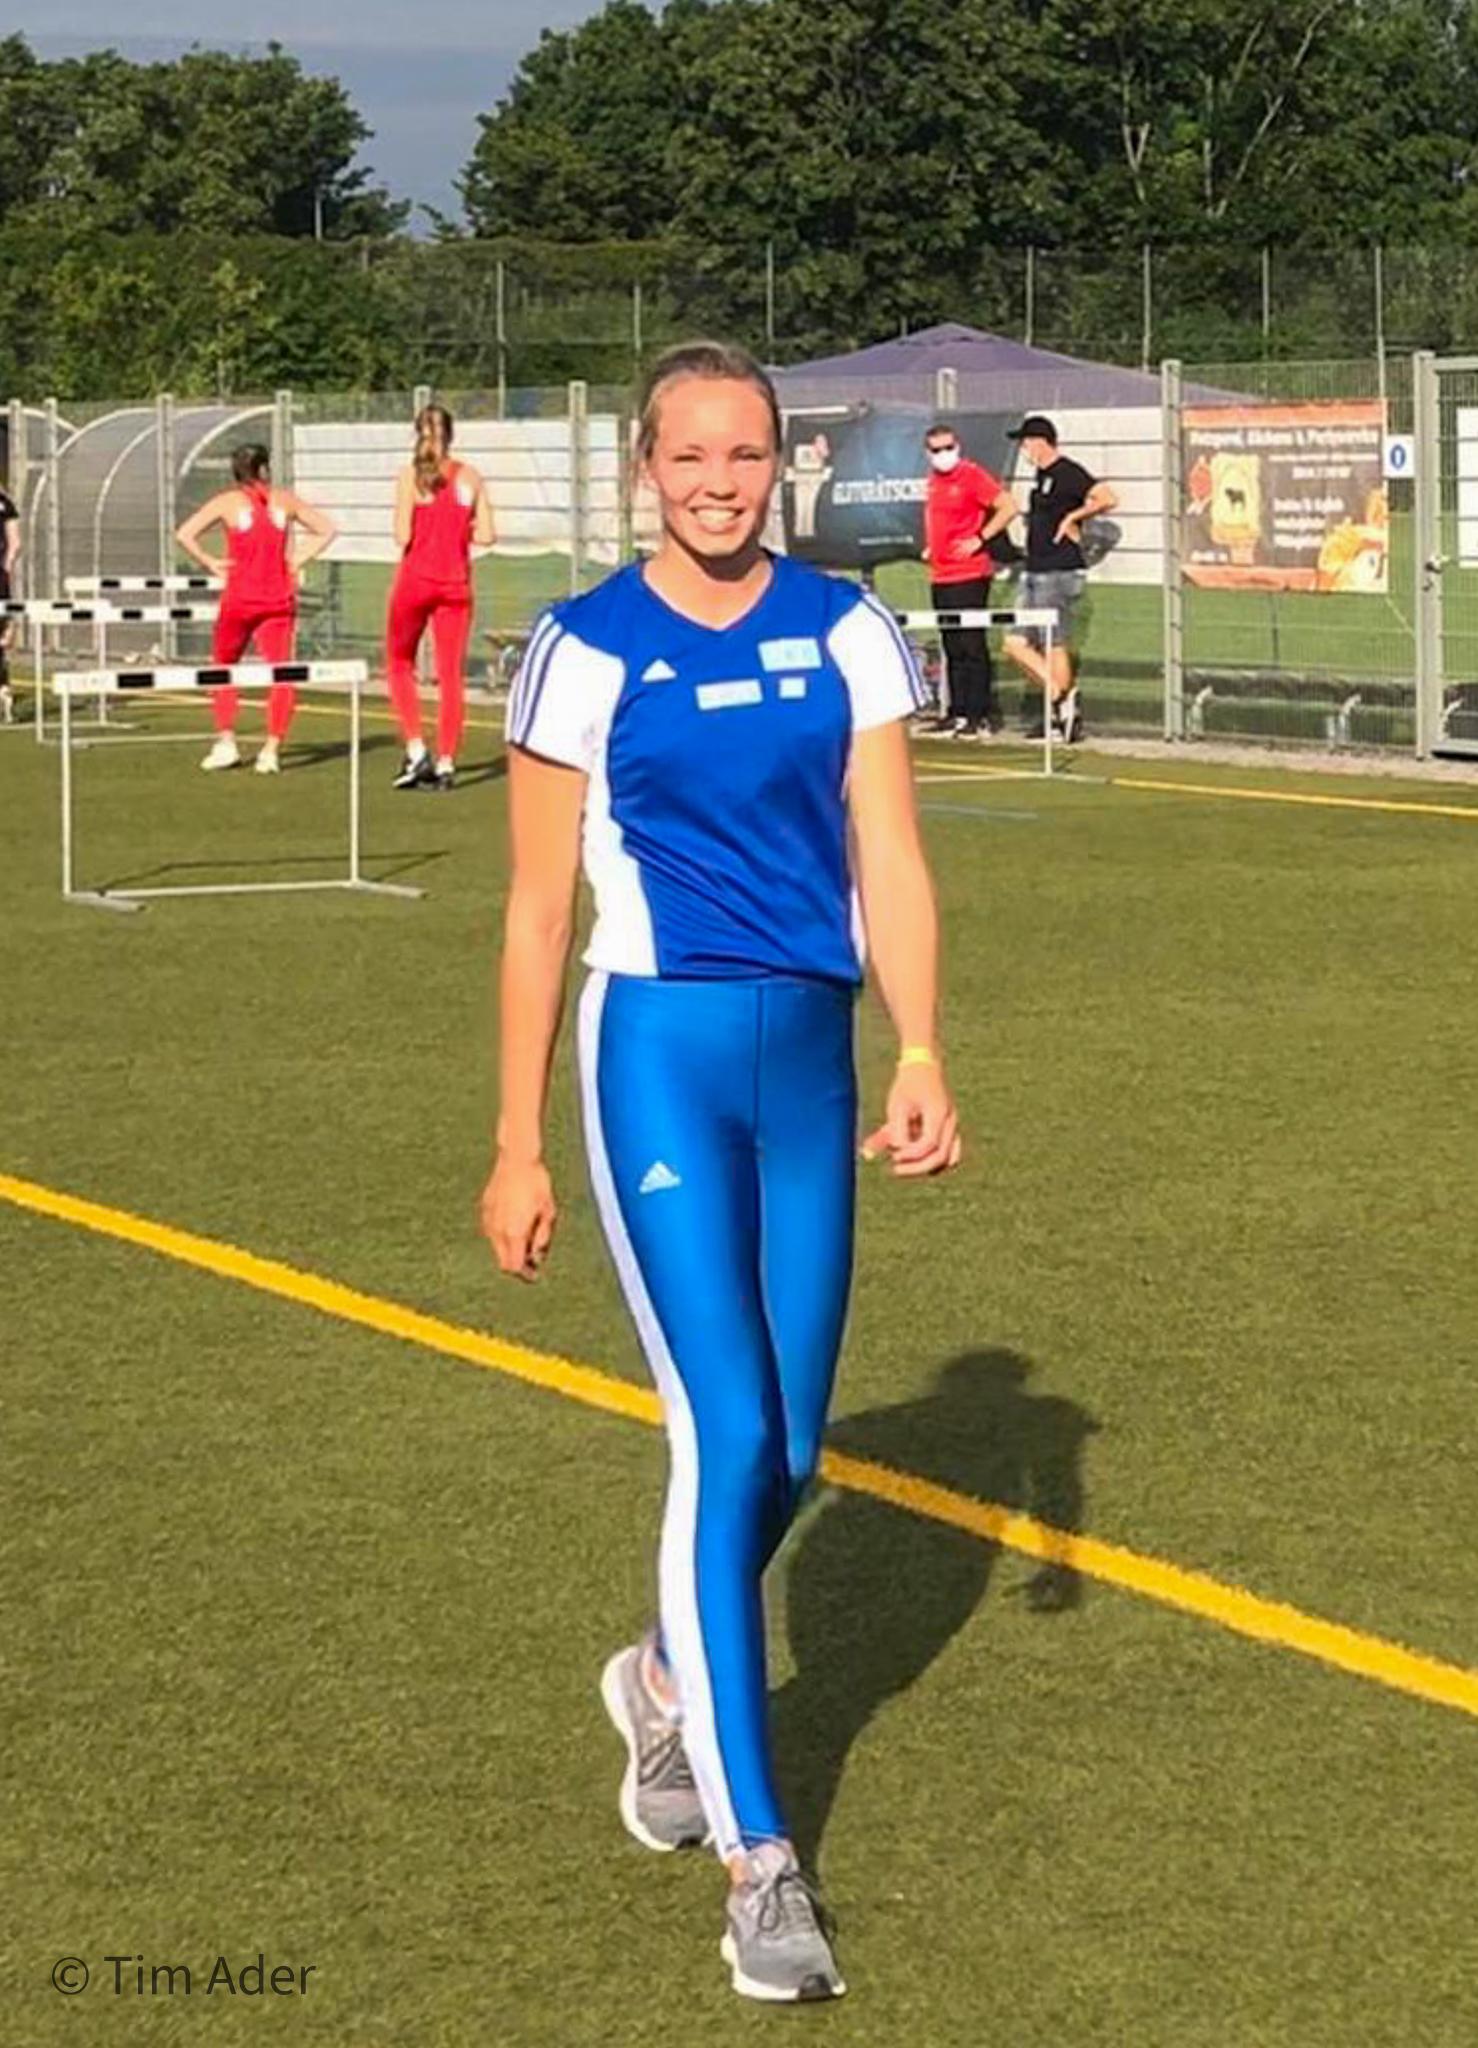 2020-08-22_Thum_Vaterstetten_Rostock - 20200822-Vaterstetten-Joanne-Schiffer